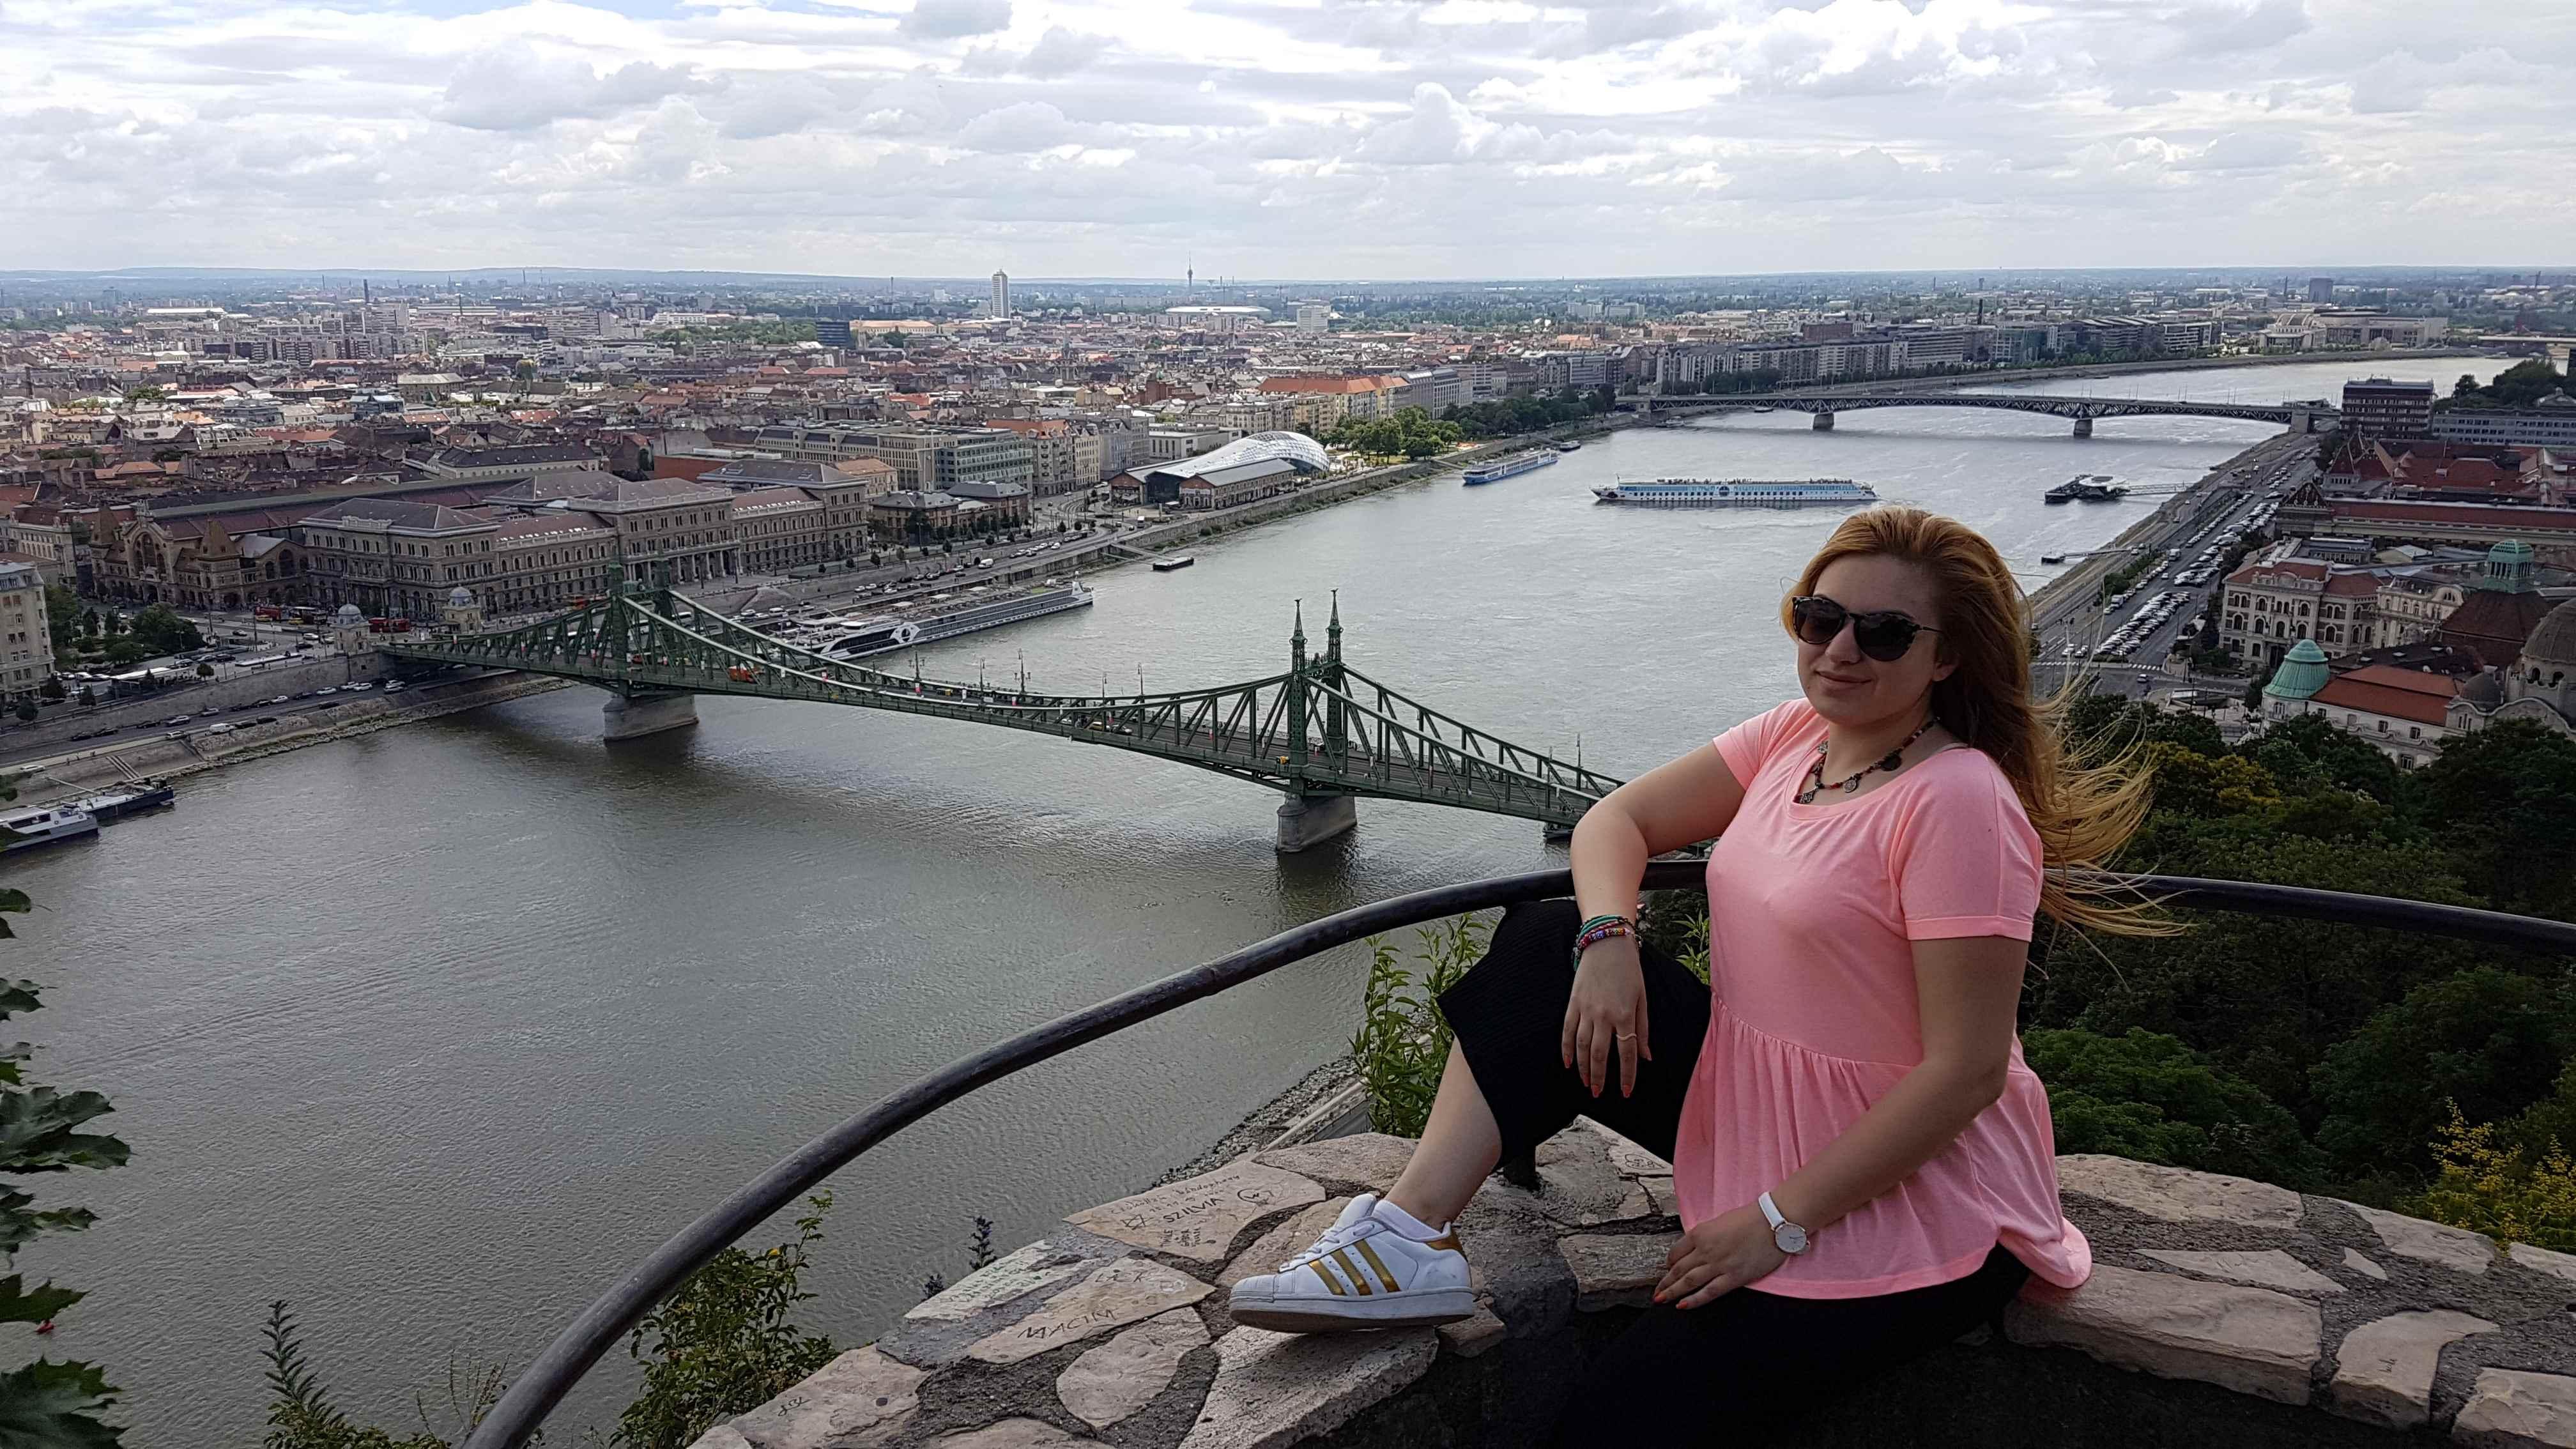 yesempatik-budapeste-gezi-seyahat-kopru-blogger